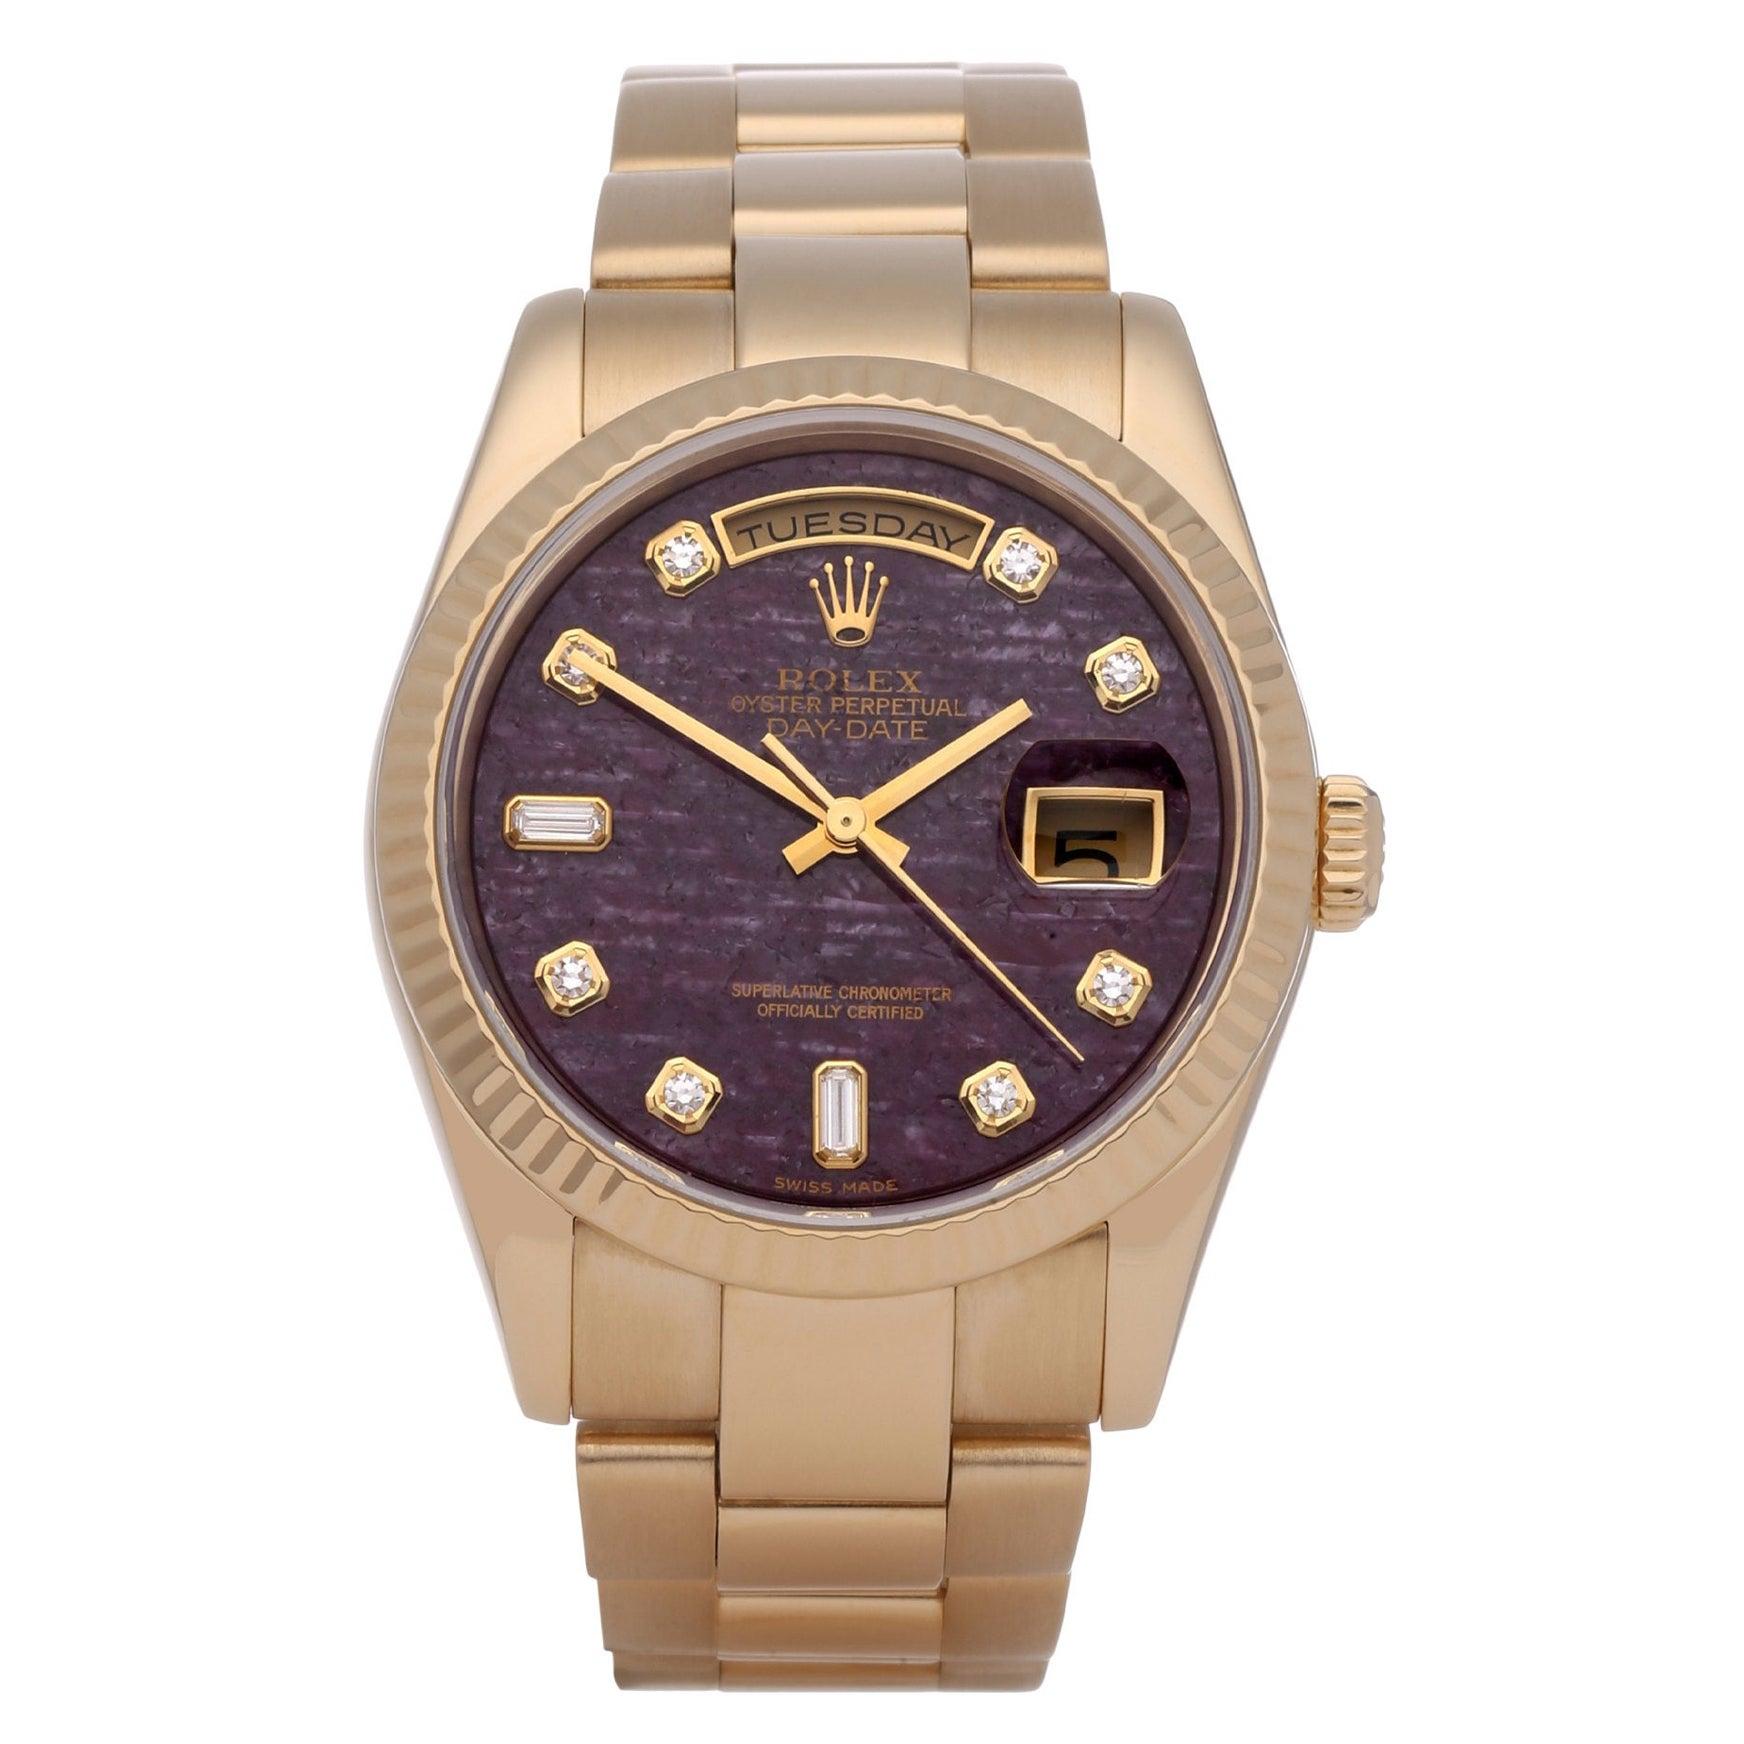 Rolex Day-Date 36 118238 Unisex Yellow Gold Rubellite Diamond Watch